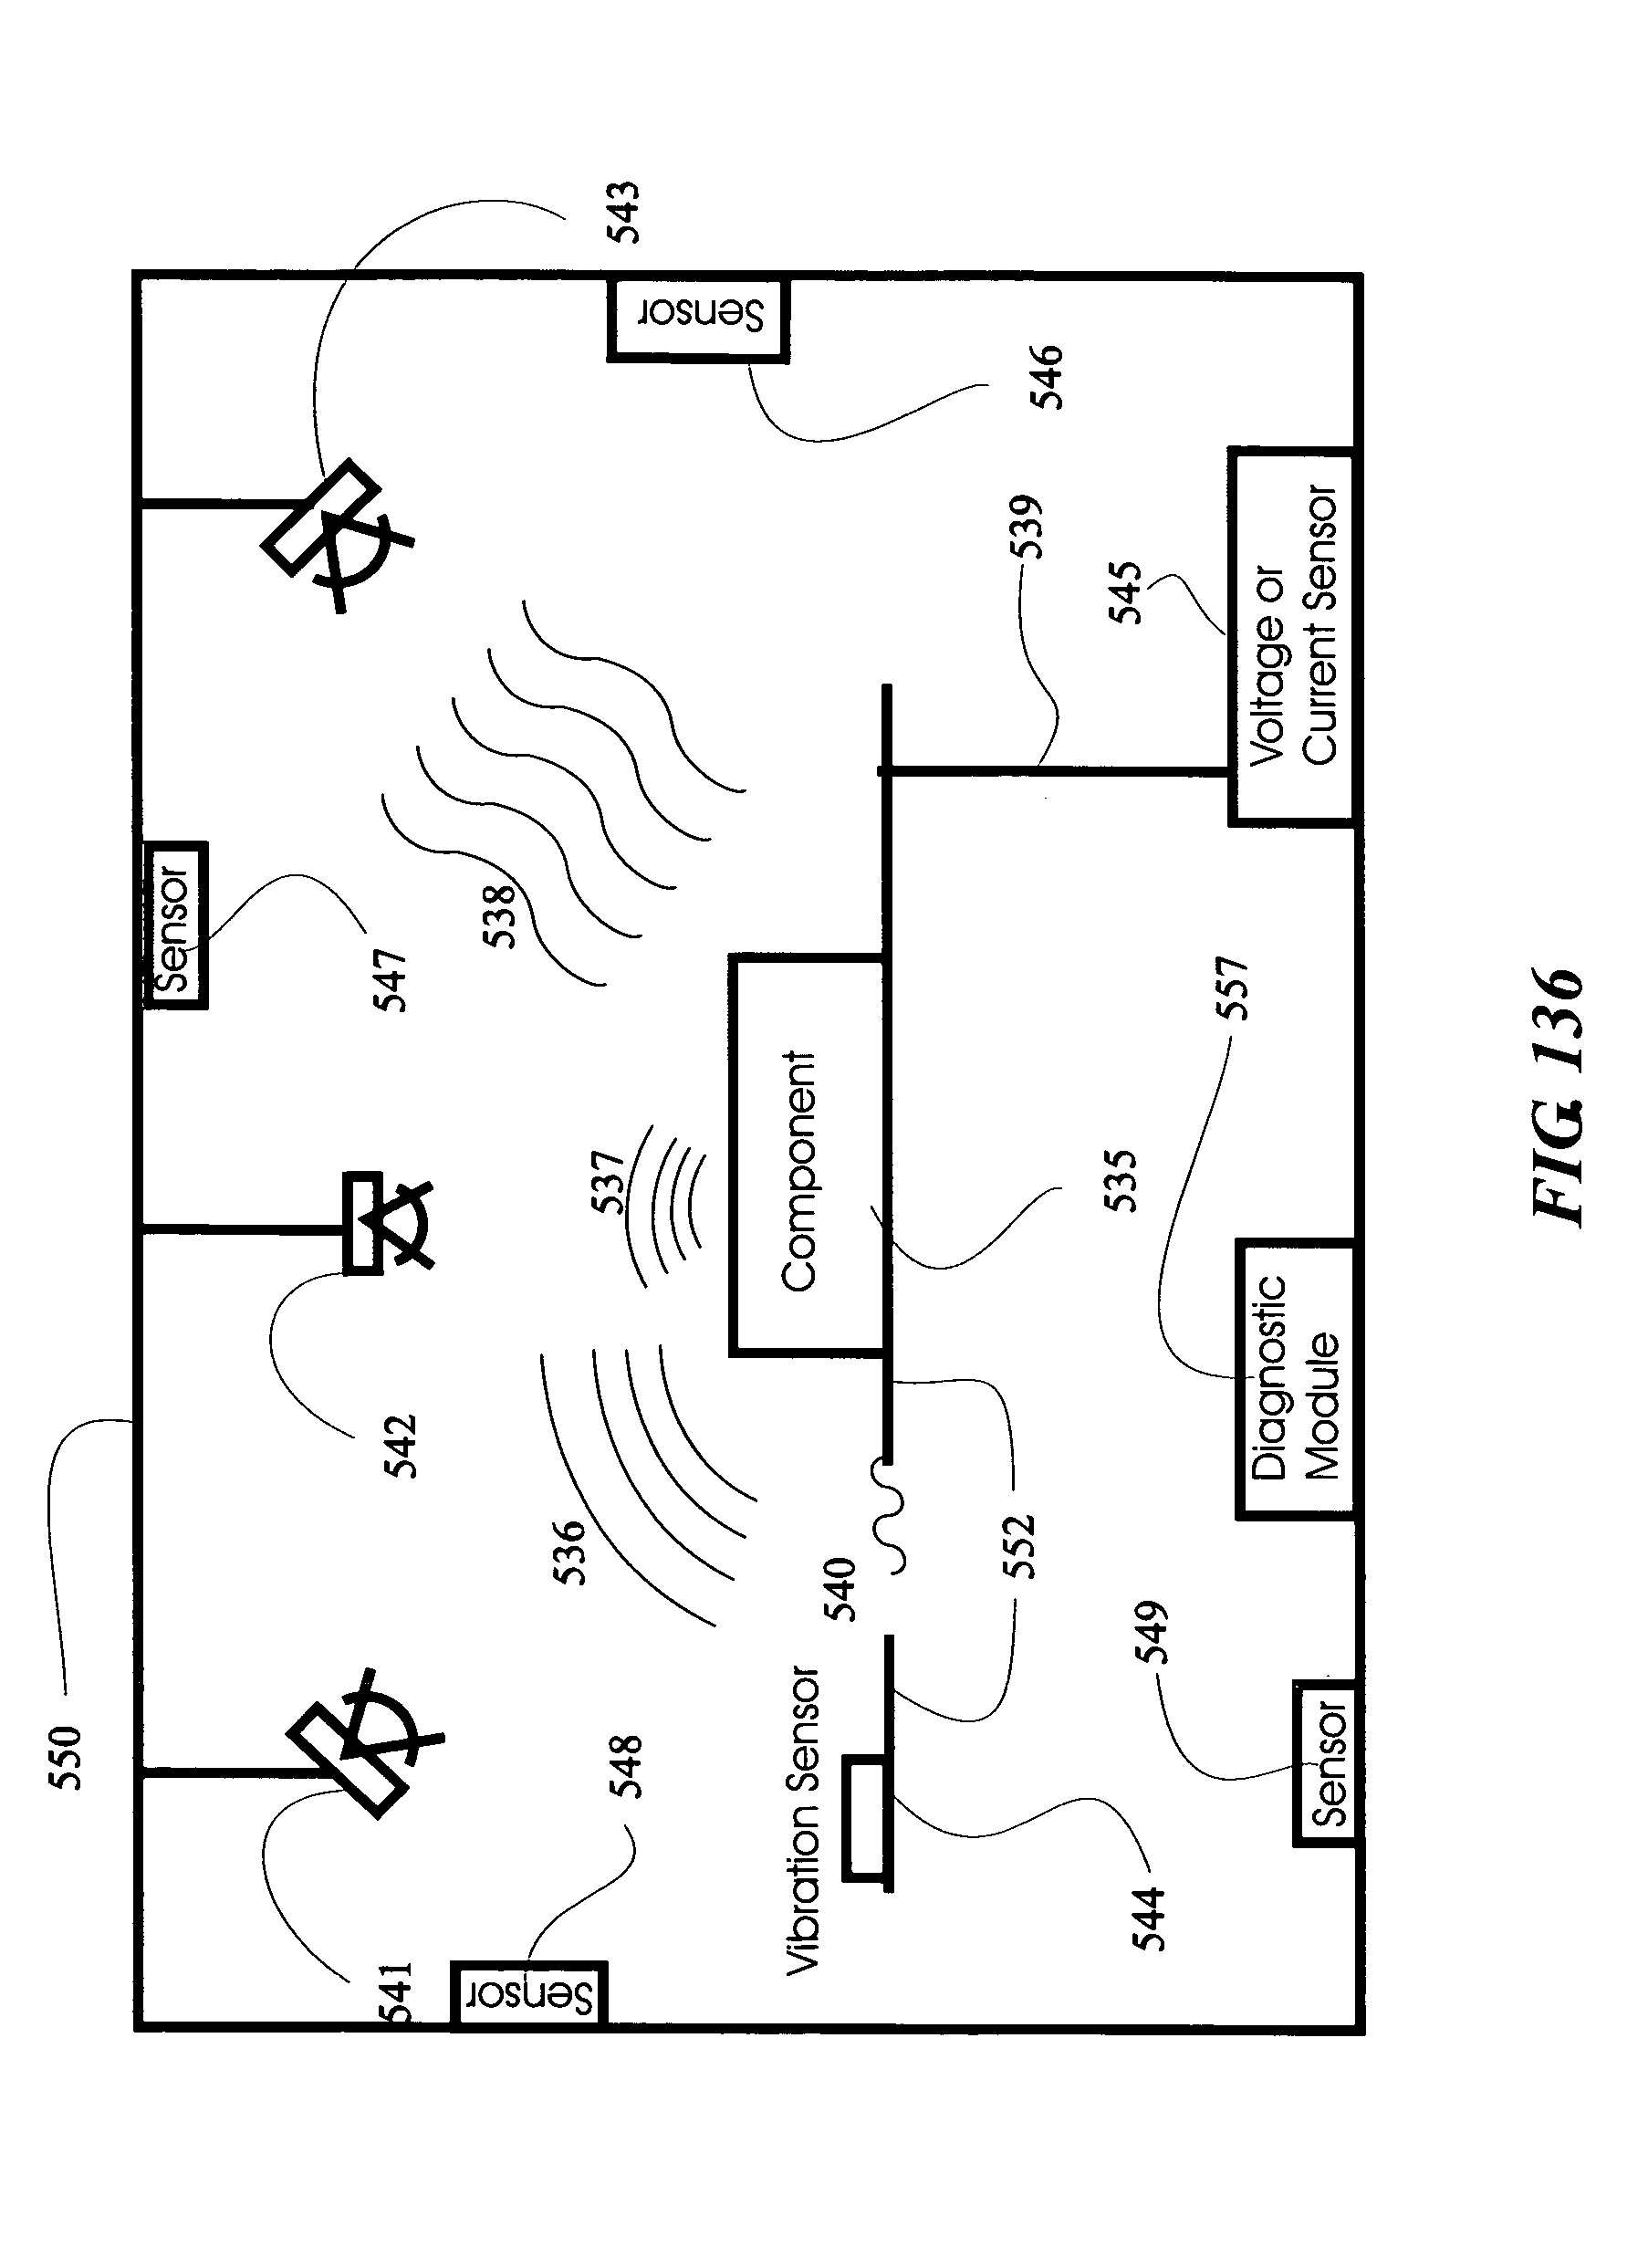 Patent US 7,164,117 B2